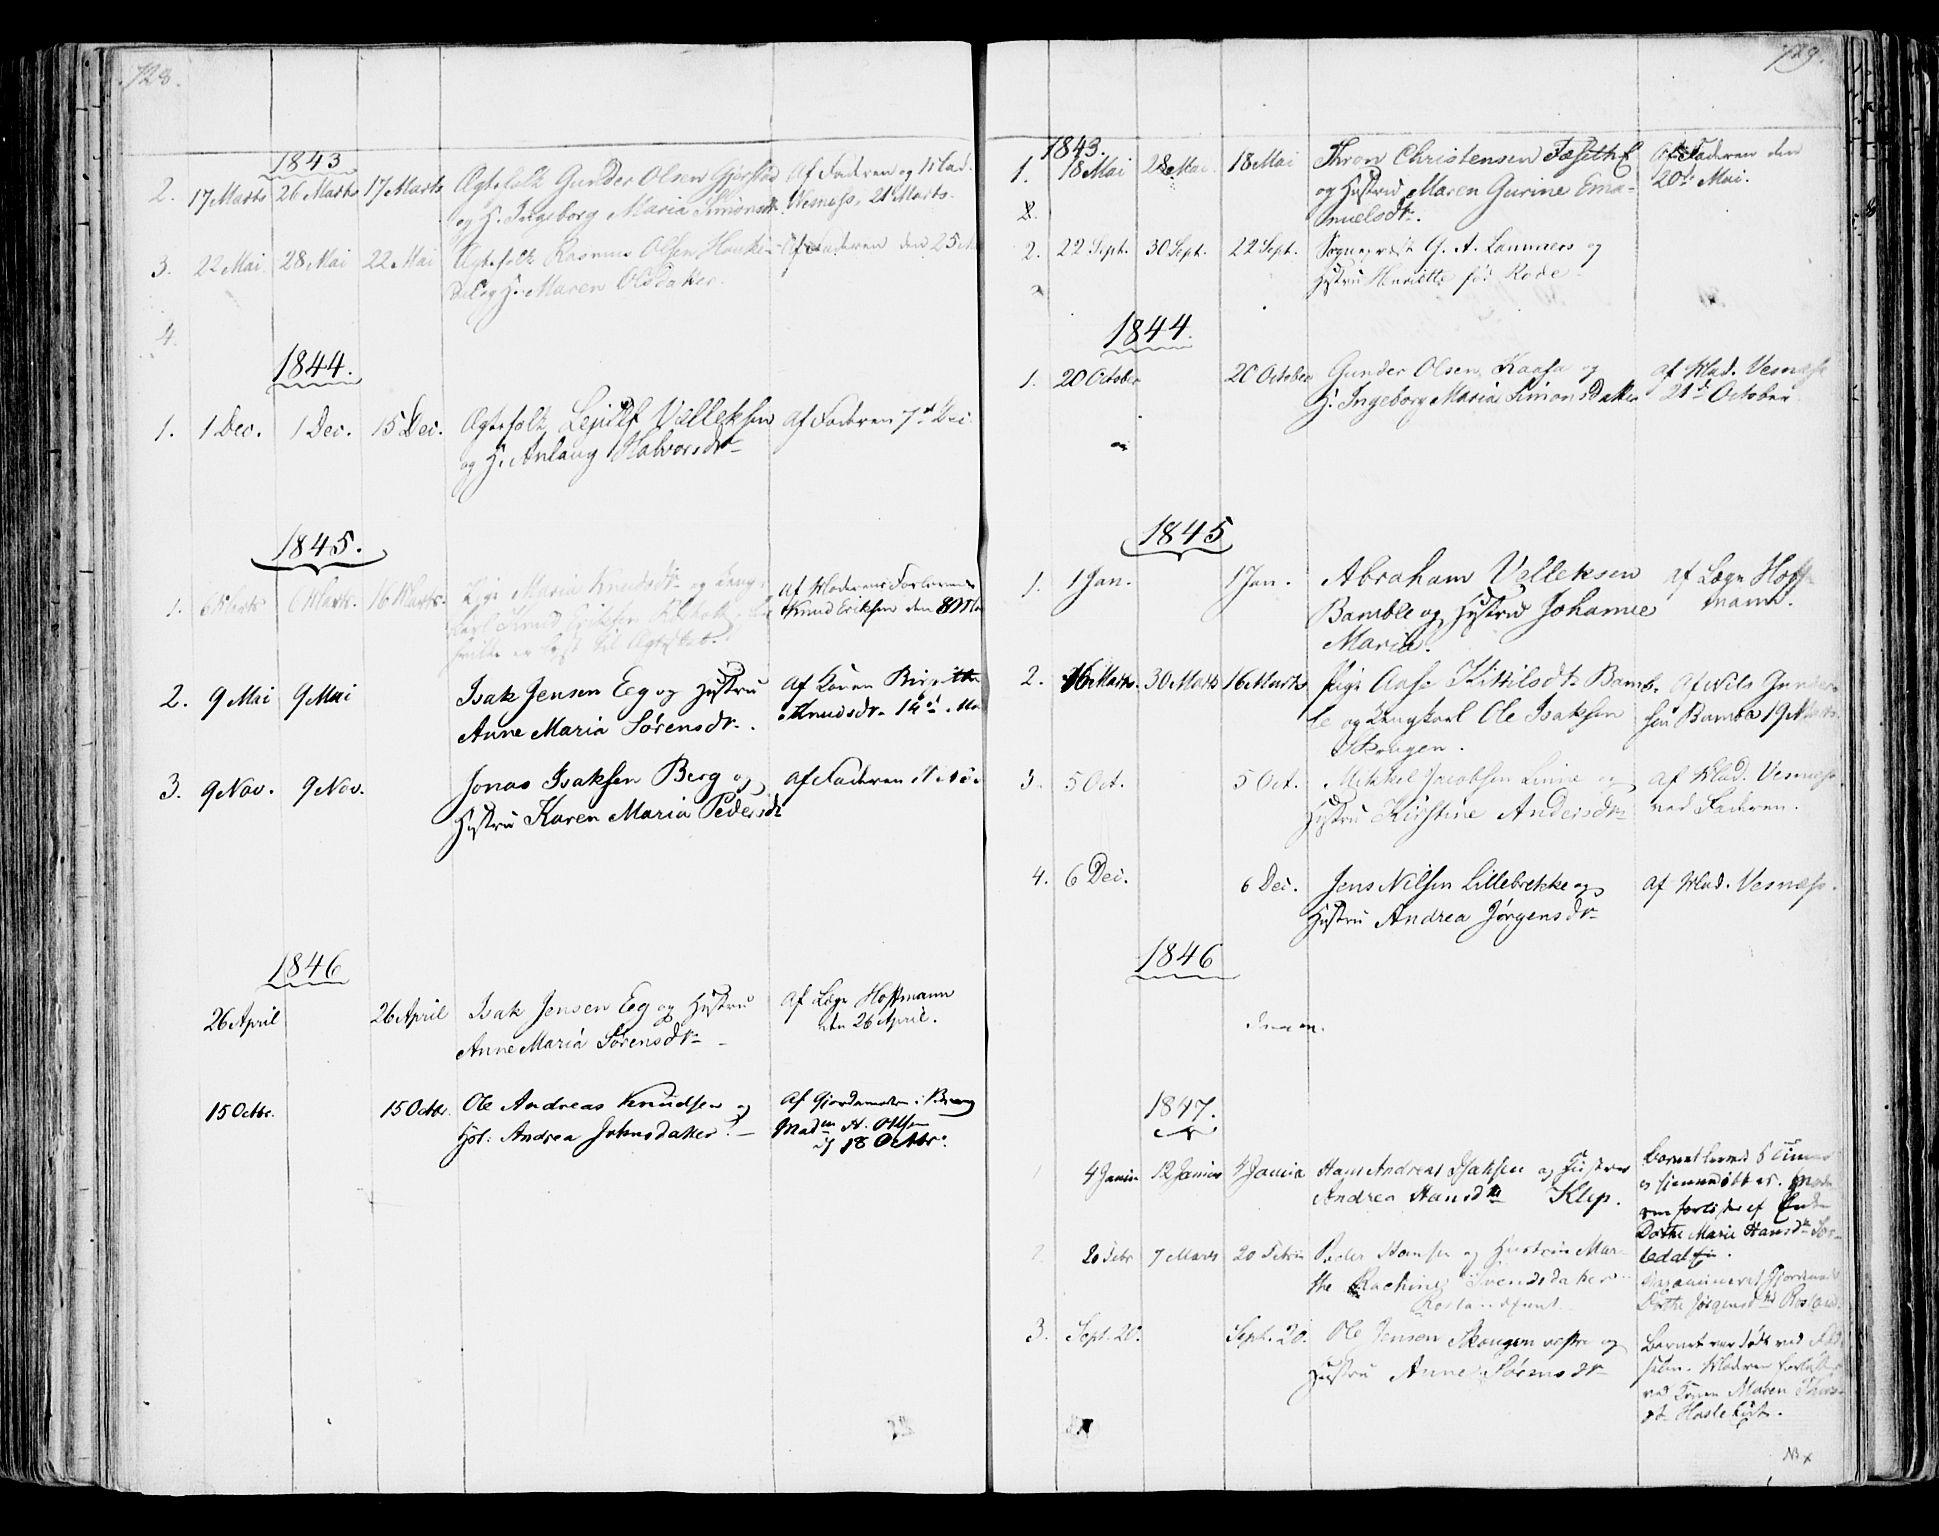 SAKO, Bamble kirkebøker, F/Fa/L0004: Ministerialbok nr. I 4, 1834-1853, s. 728-729